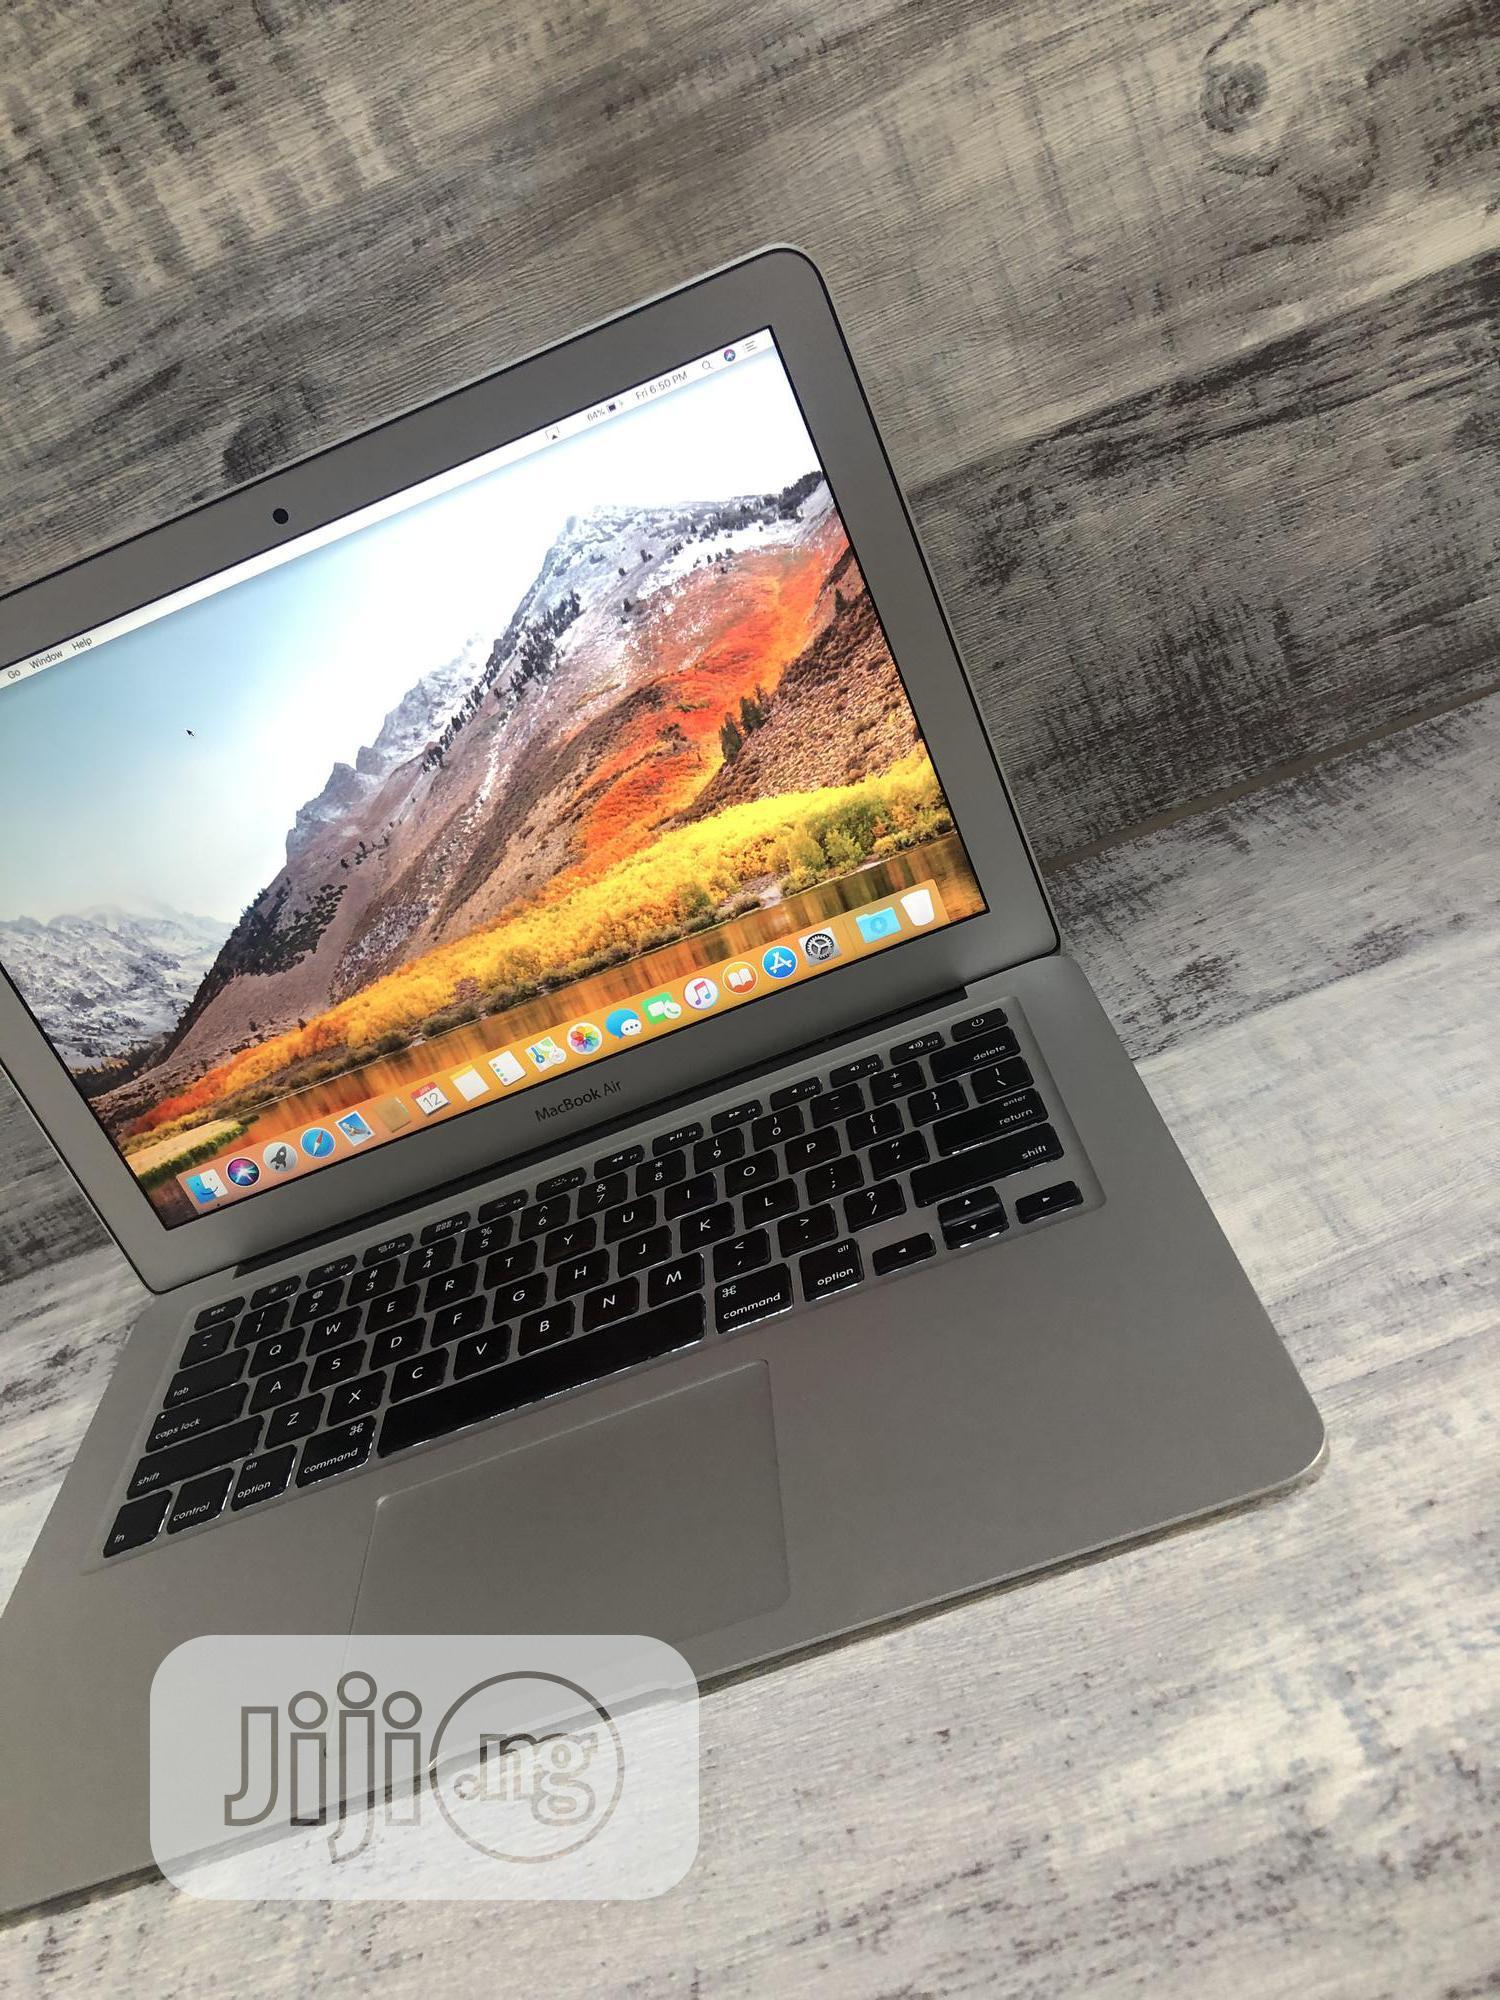 Laptop Apple MacBook Air 2017 8GB Intel Core i7 SSD 128GB | Laptops & Computers for sale in Ikeja, Lagos State, Nigeria